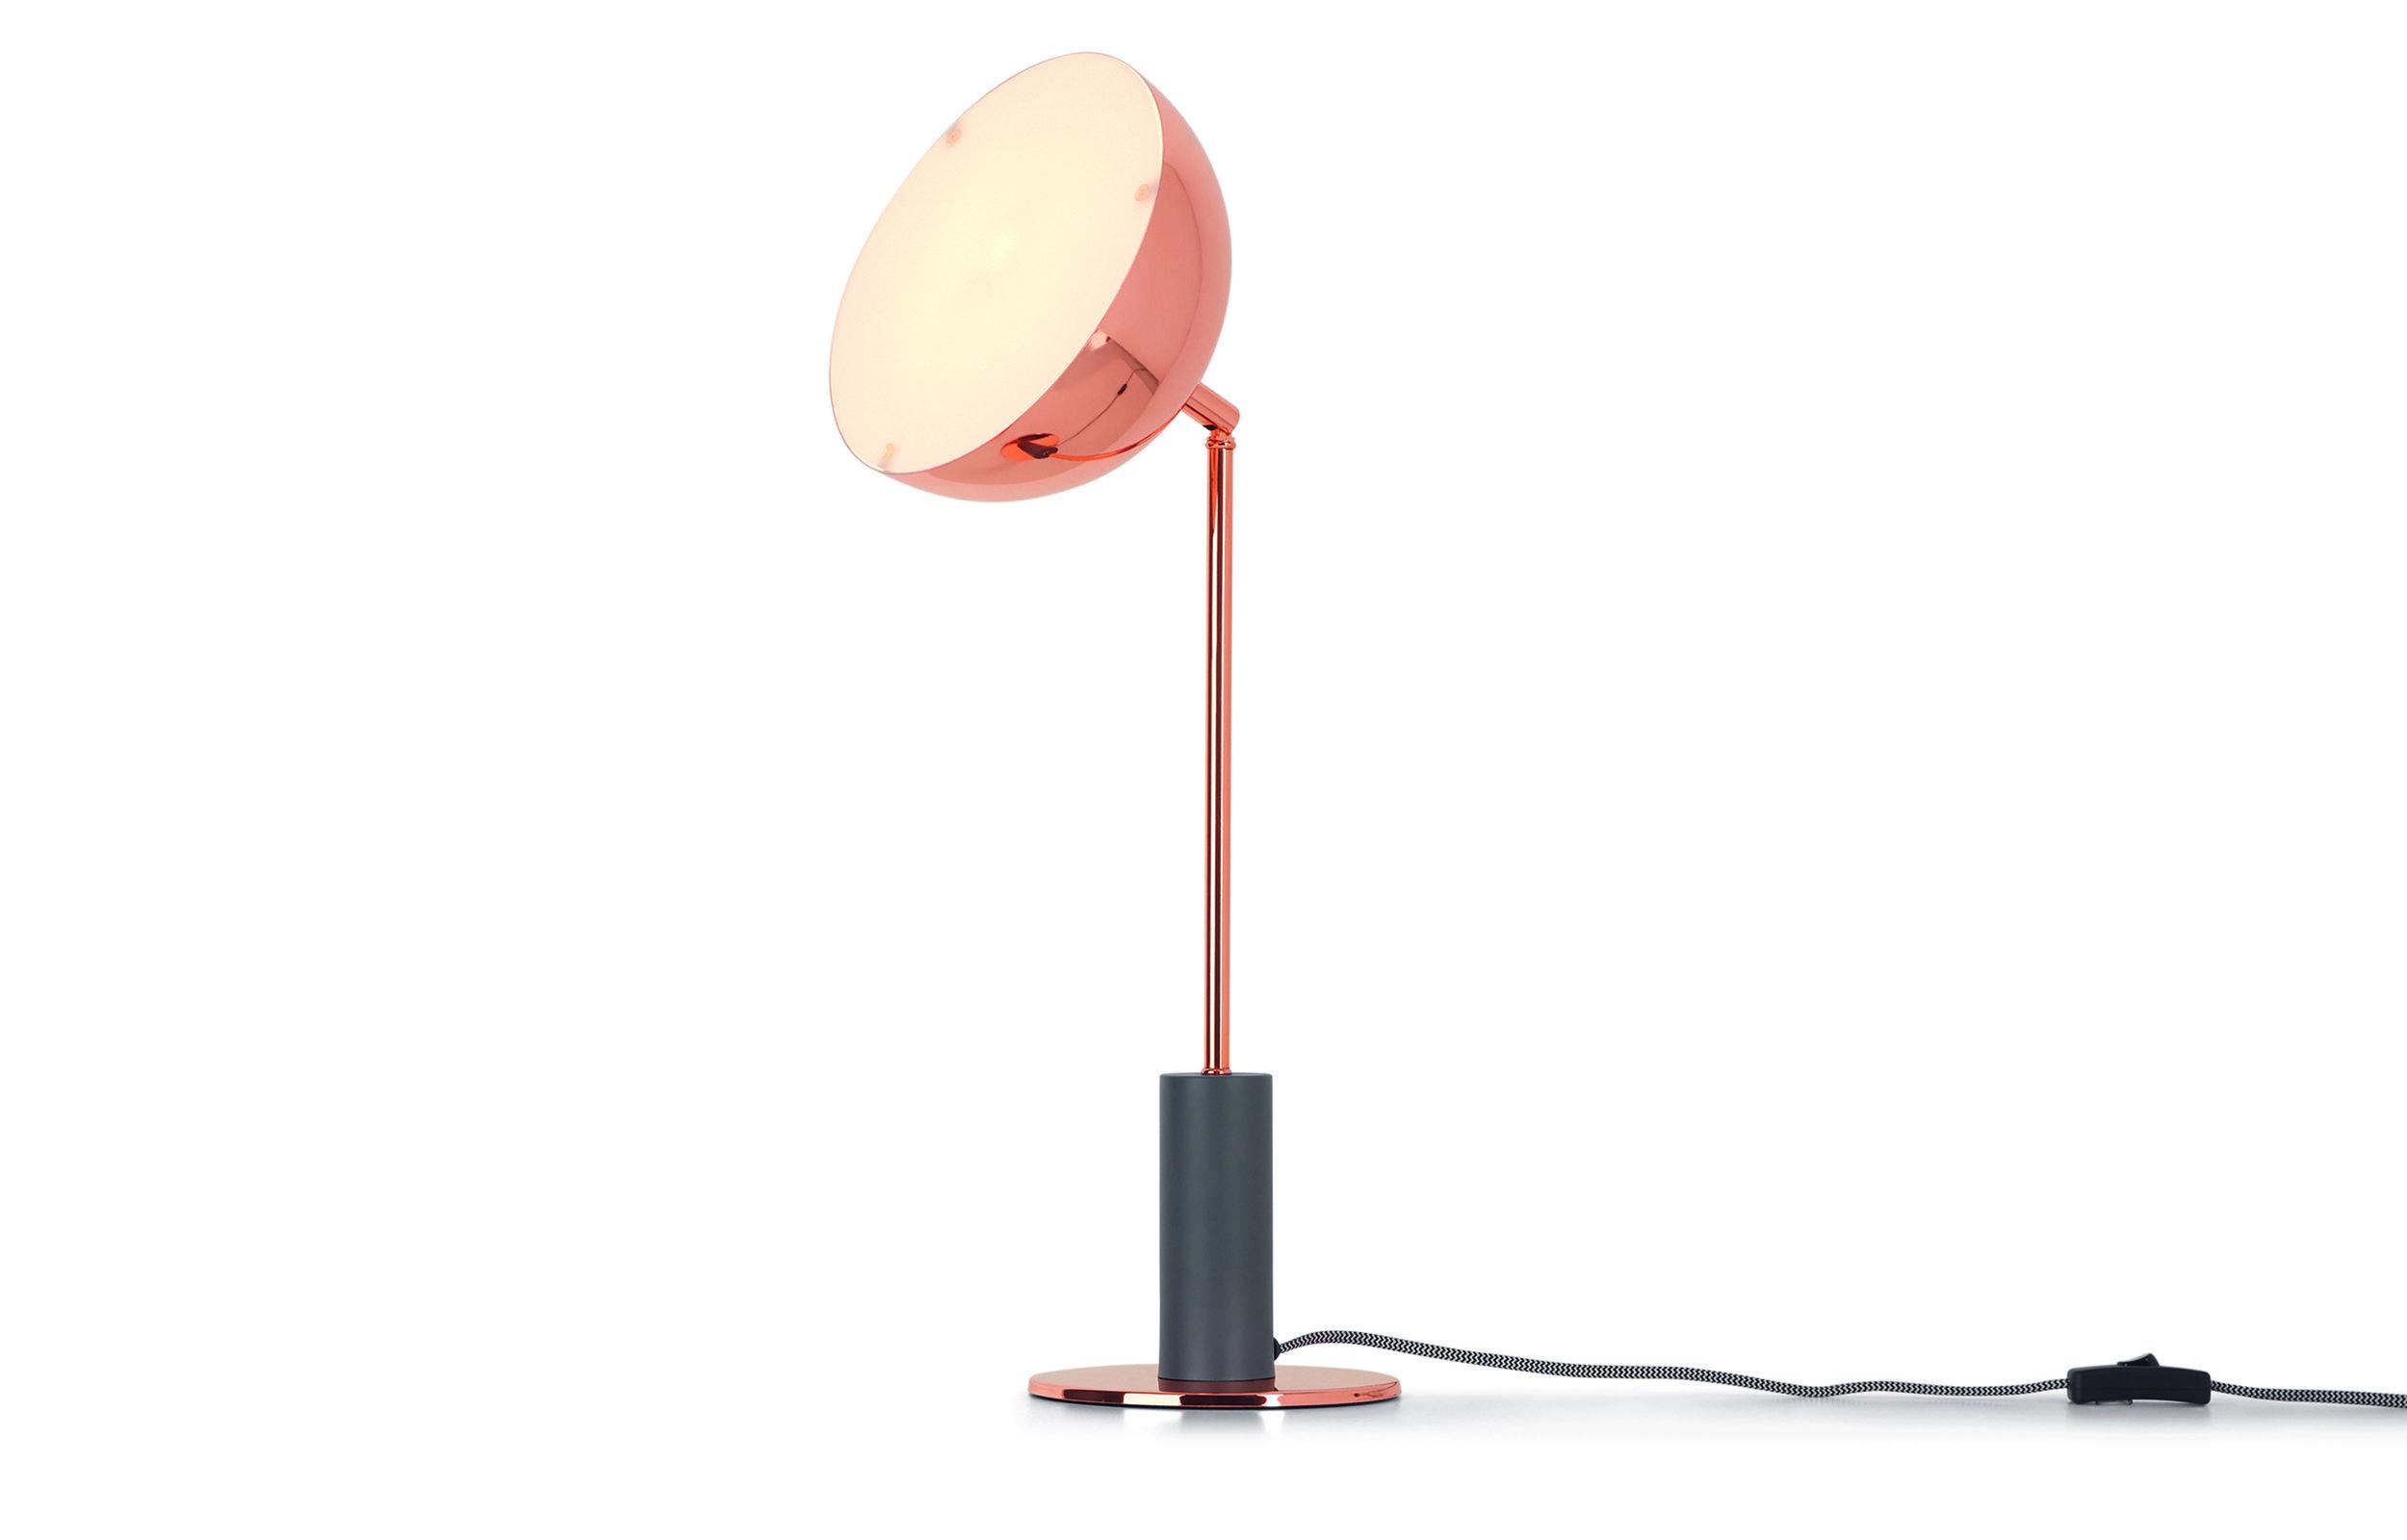 TLPTLB007ZCO-UK_Lumo_Table_Lamp_Copper_Charocoal_Grey_PR01.jpg